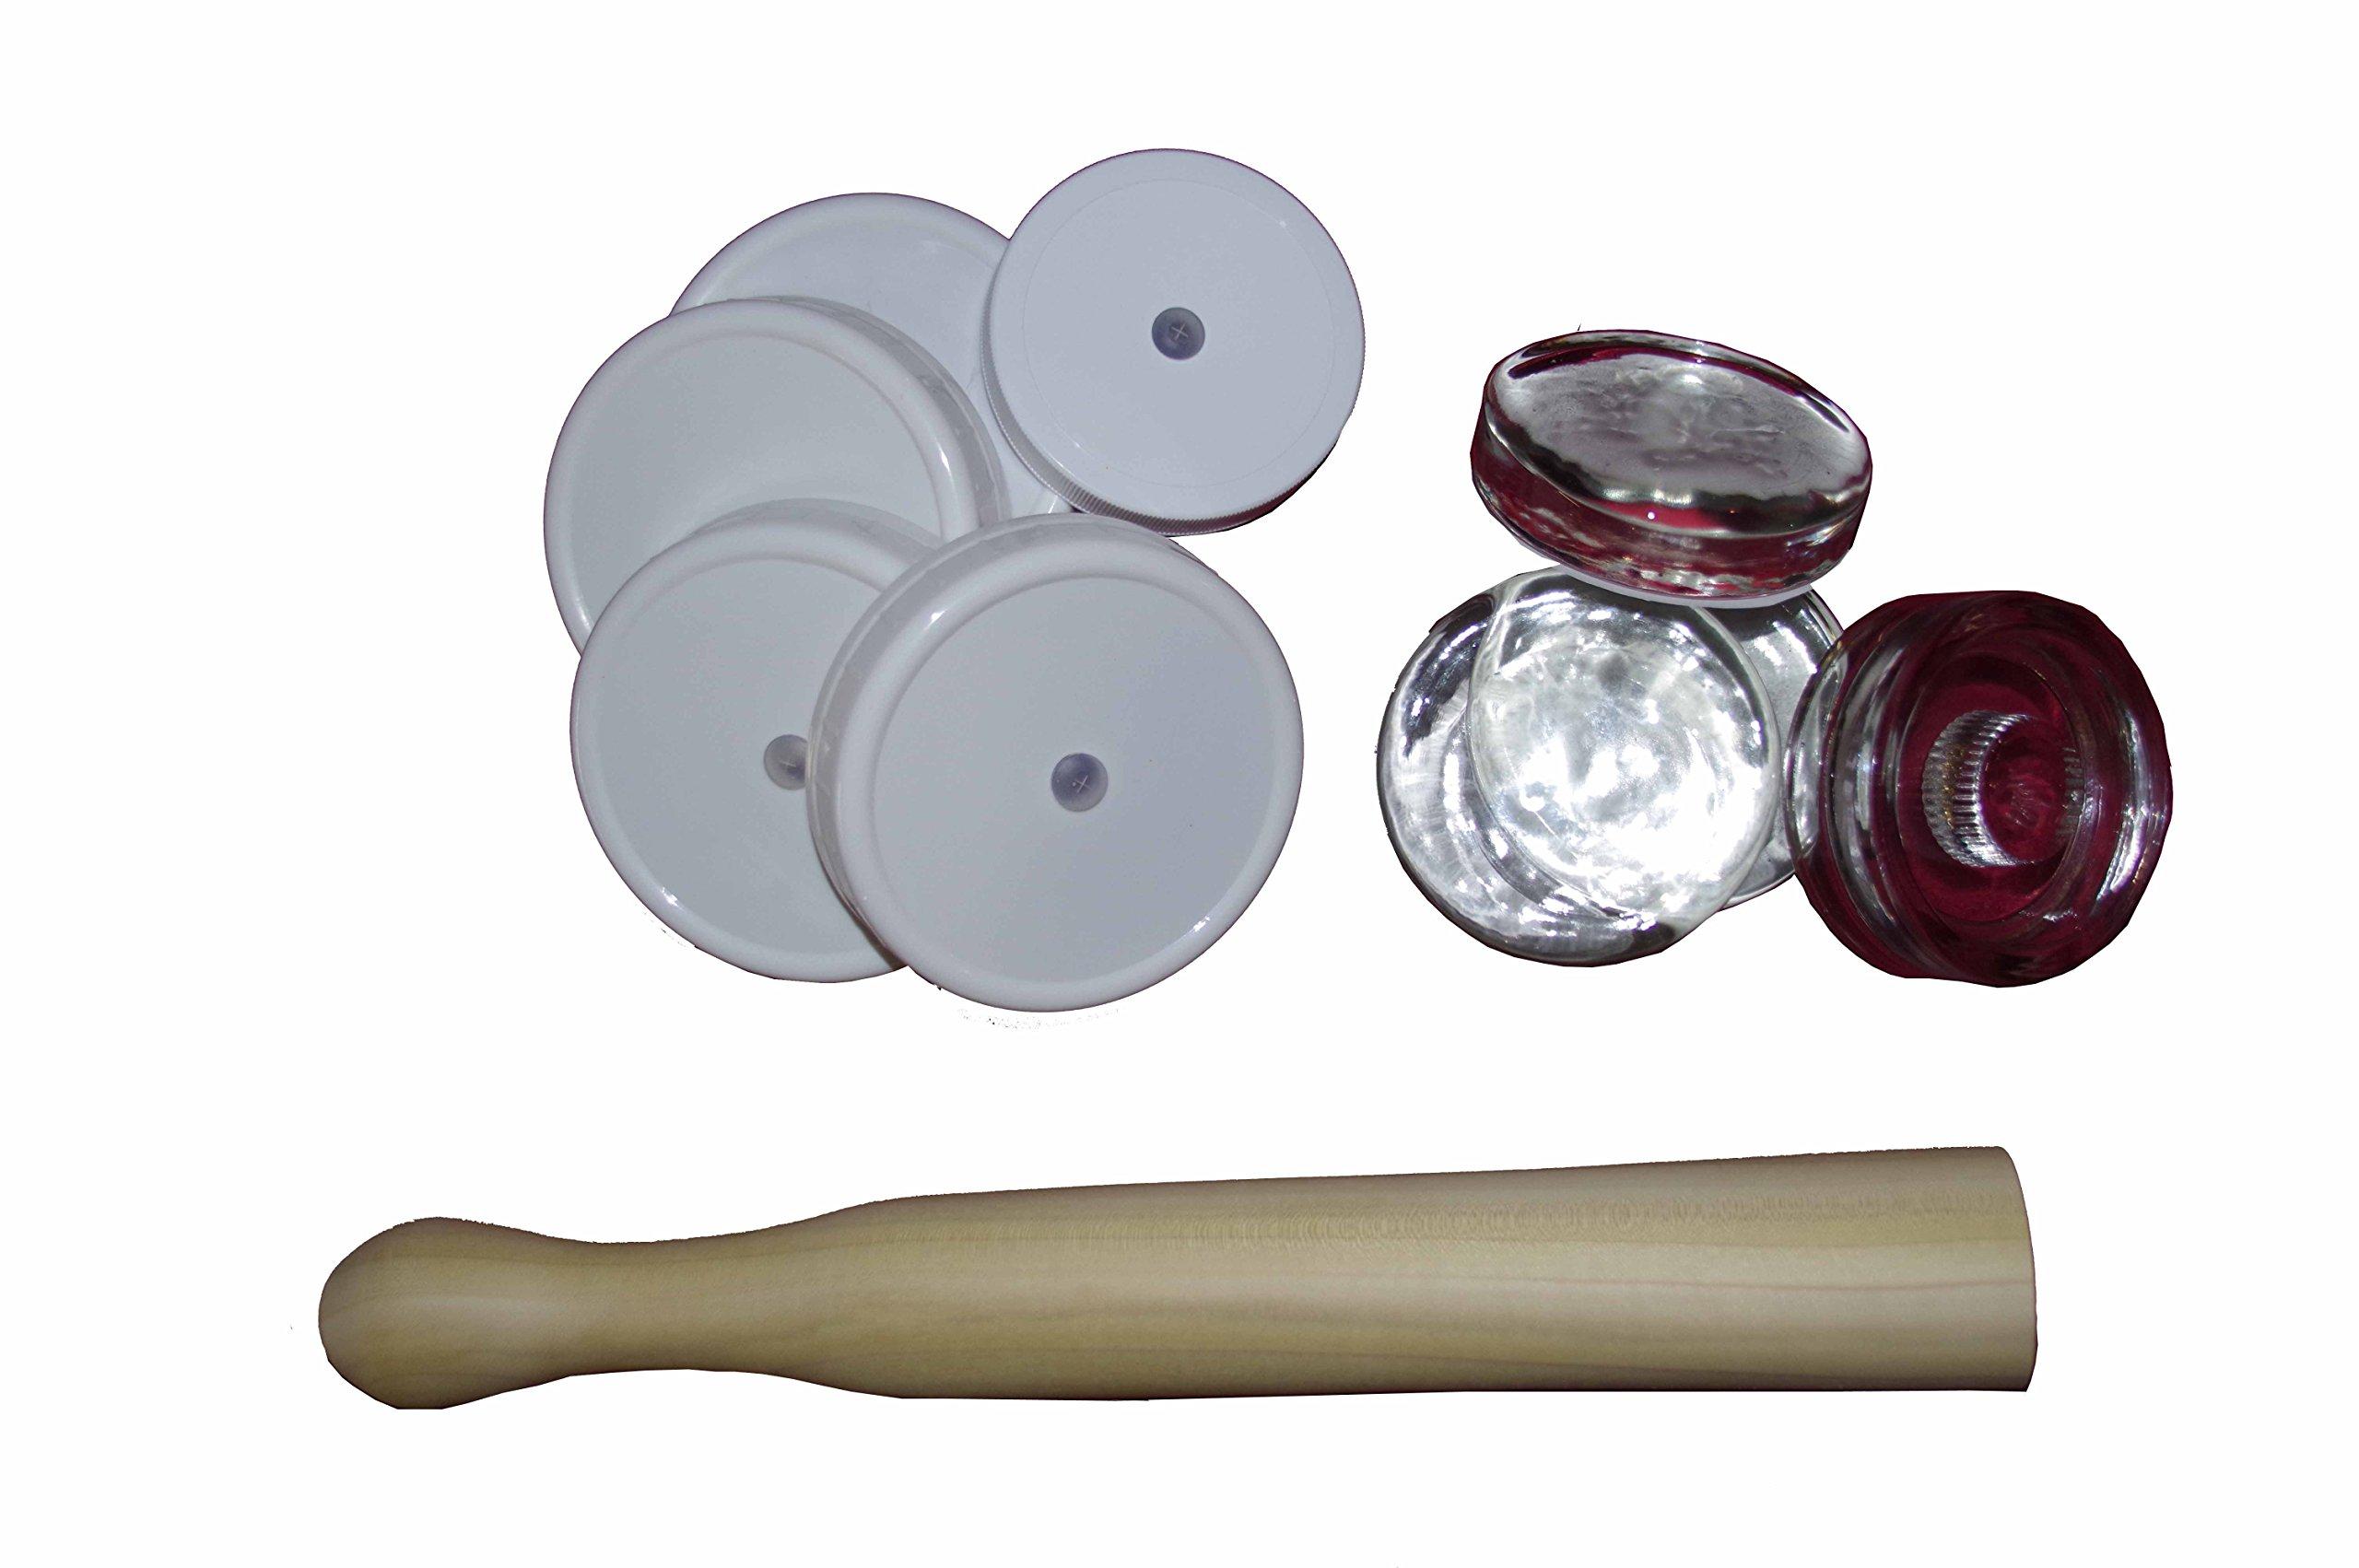 Fermentation Kit (1 sauerkraut tamper x 5 Airlocks x 4 Fermentation weights)